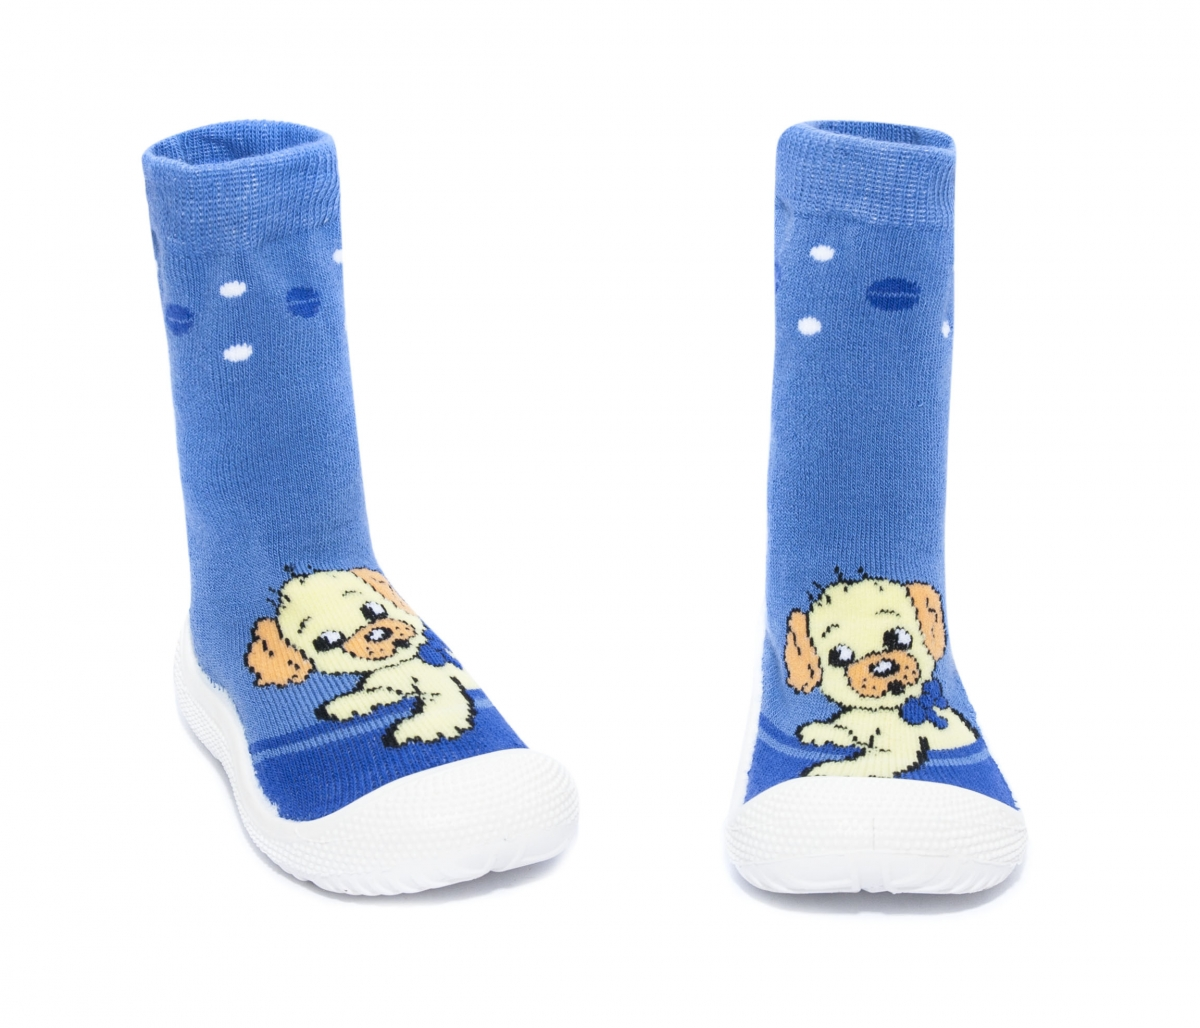 Incaltaminte copii de interior flexibila catel albastru 22-30